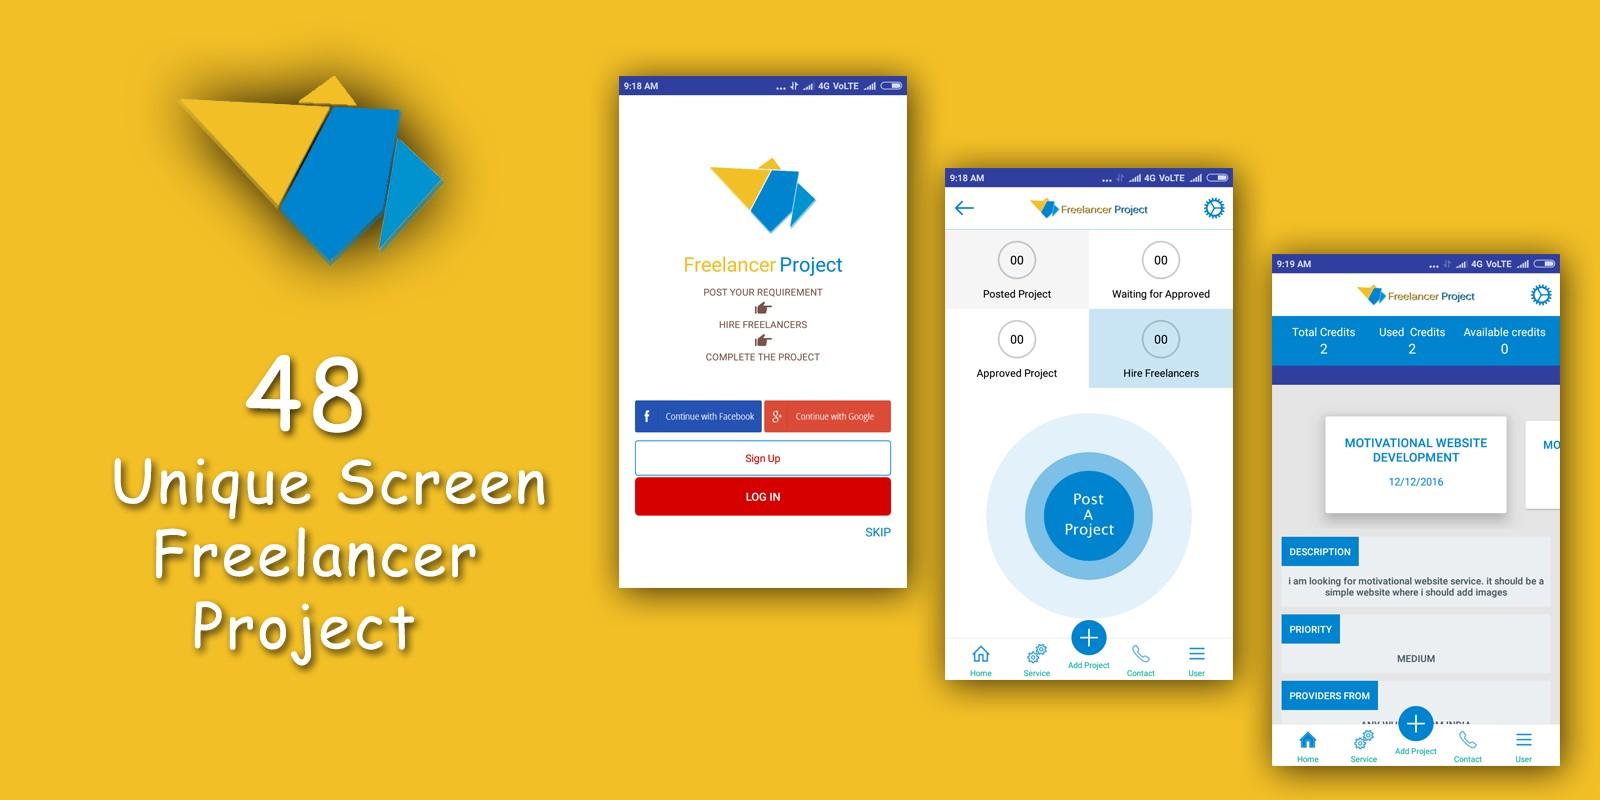 Freelancer Project - Android Studio UI KIT